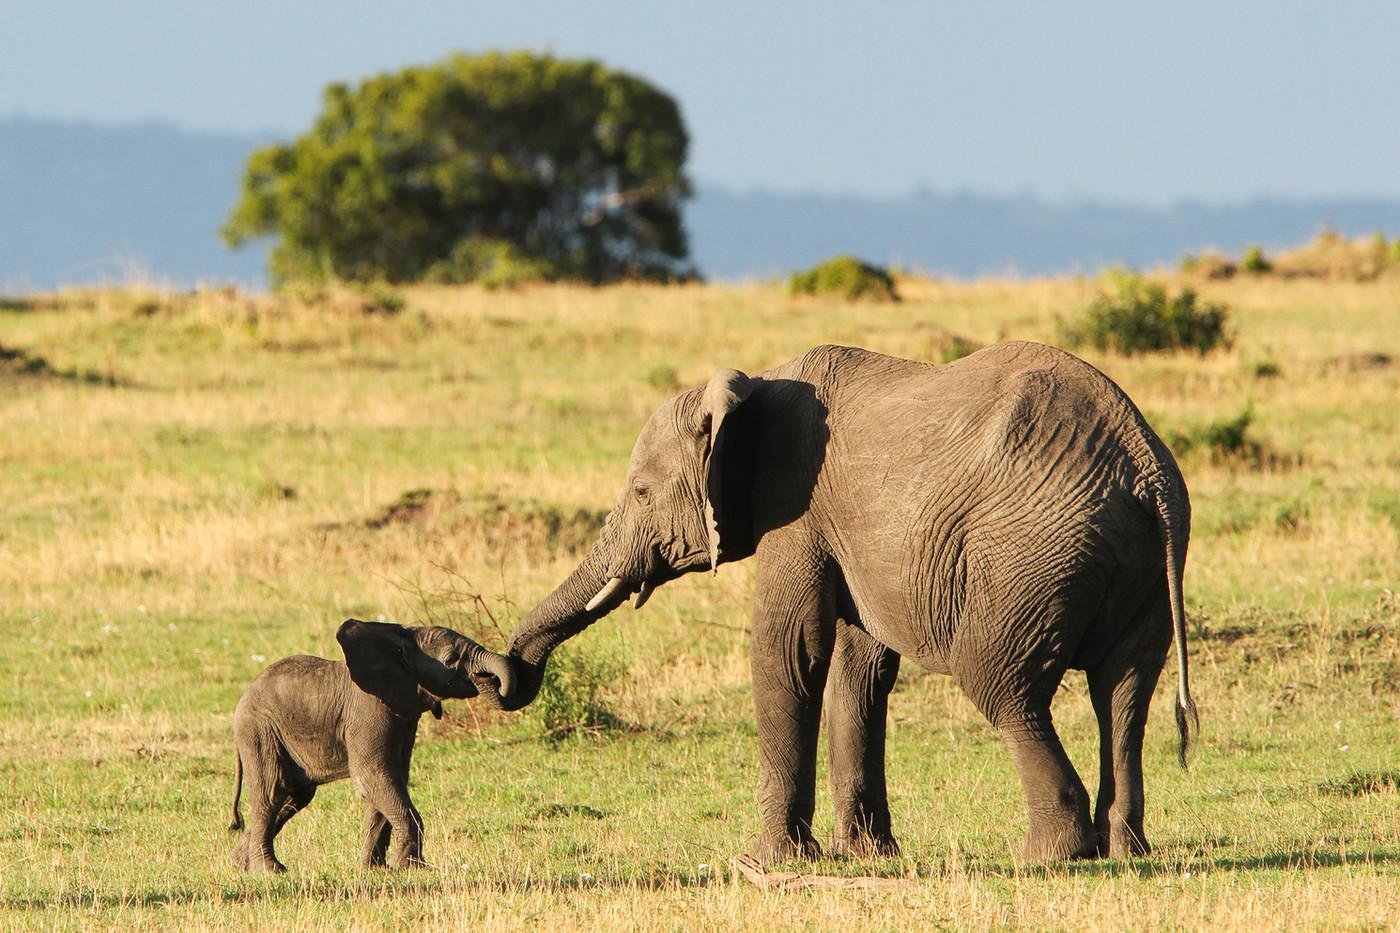 Elephant calf & sibling in the Serengeti NP, Tanzania